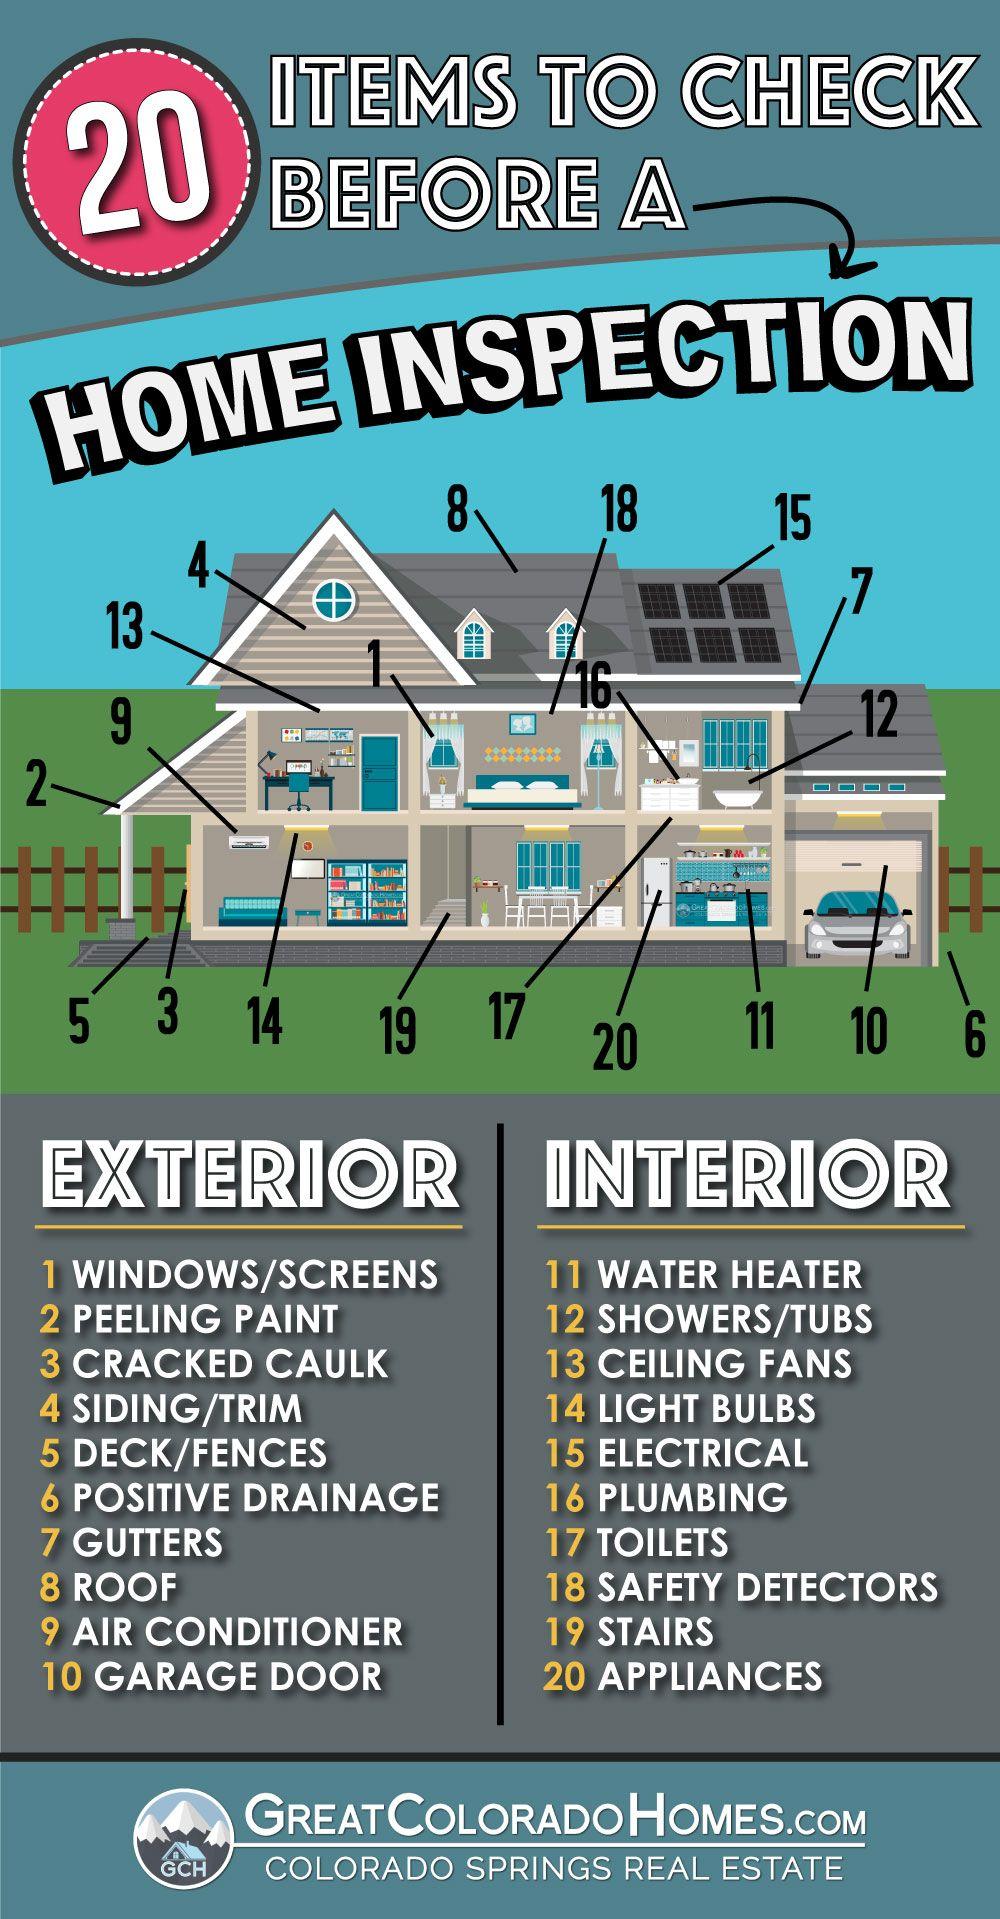 Getting a Home Inspection In Louisville Kentucky- List of Home Inspectors Louisville, KY